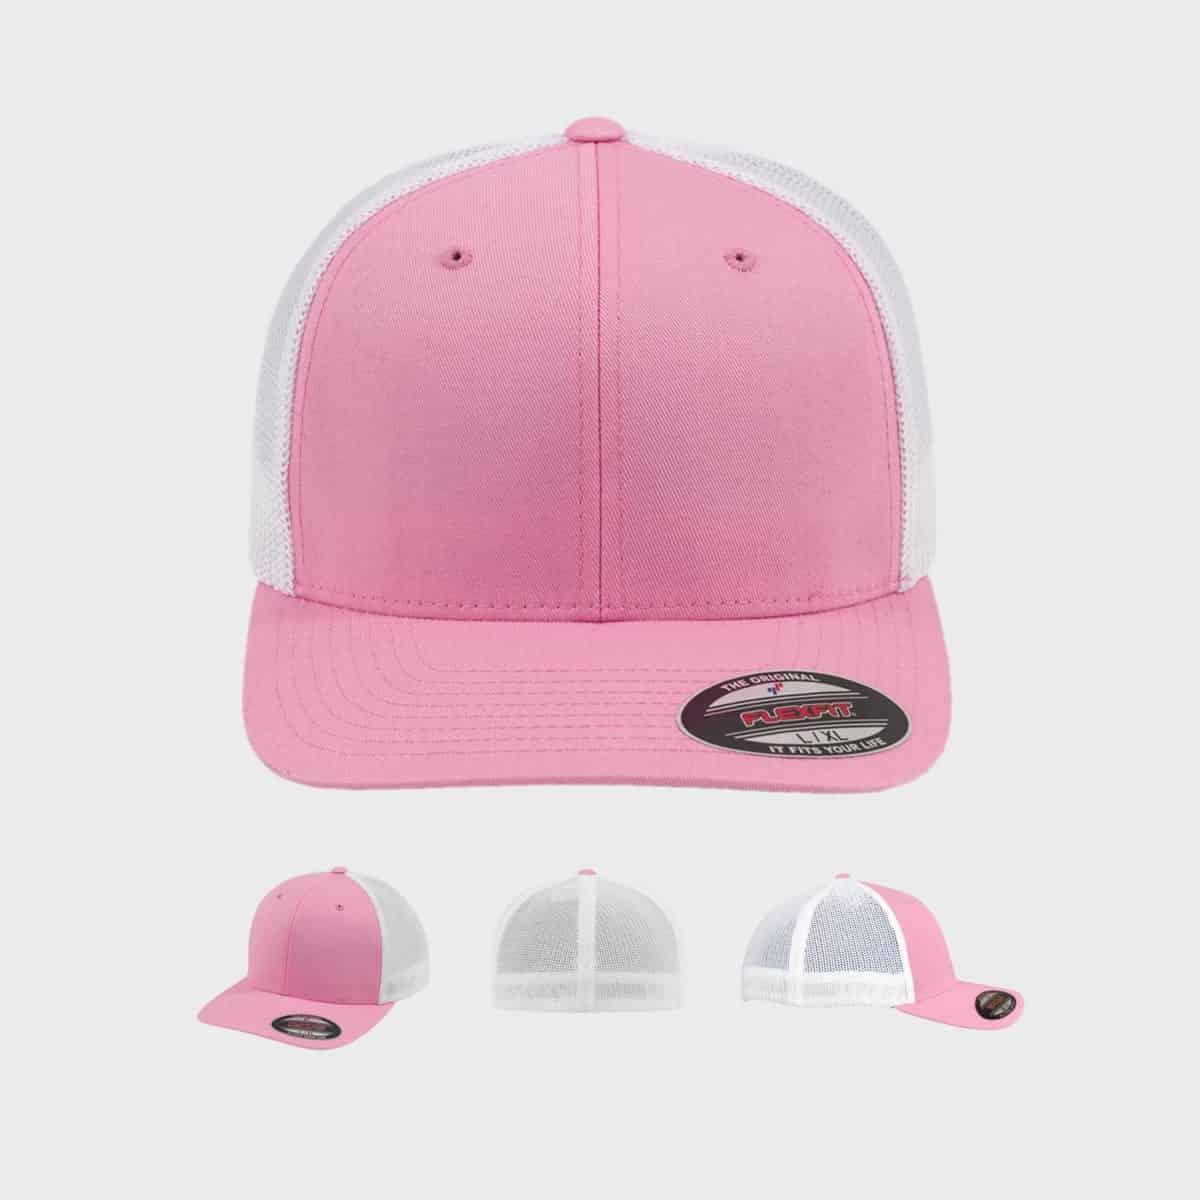 Flexfit TruckerCaps FFE 6511T Pink White Front Extra